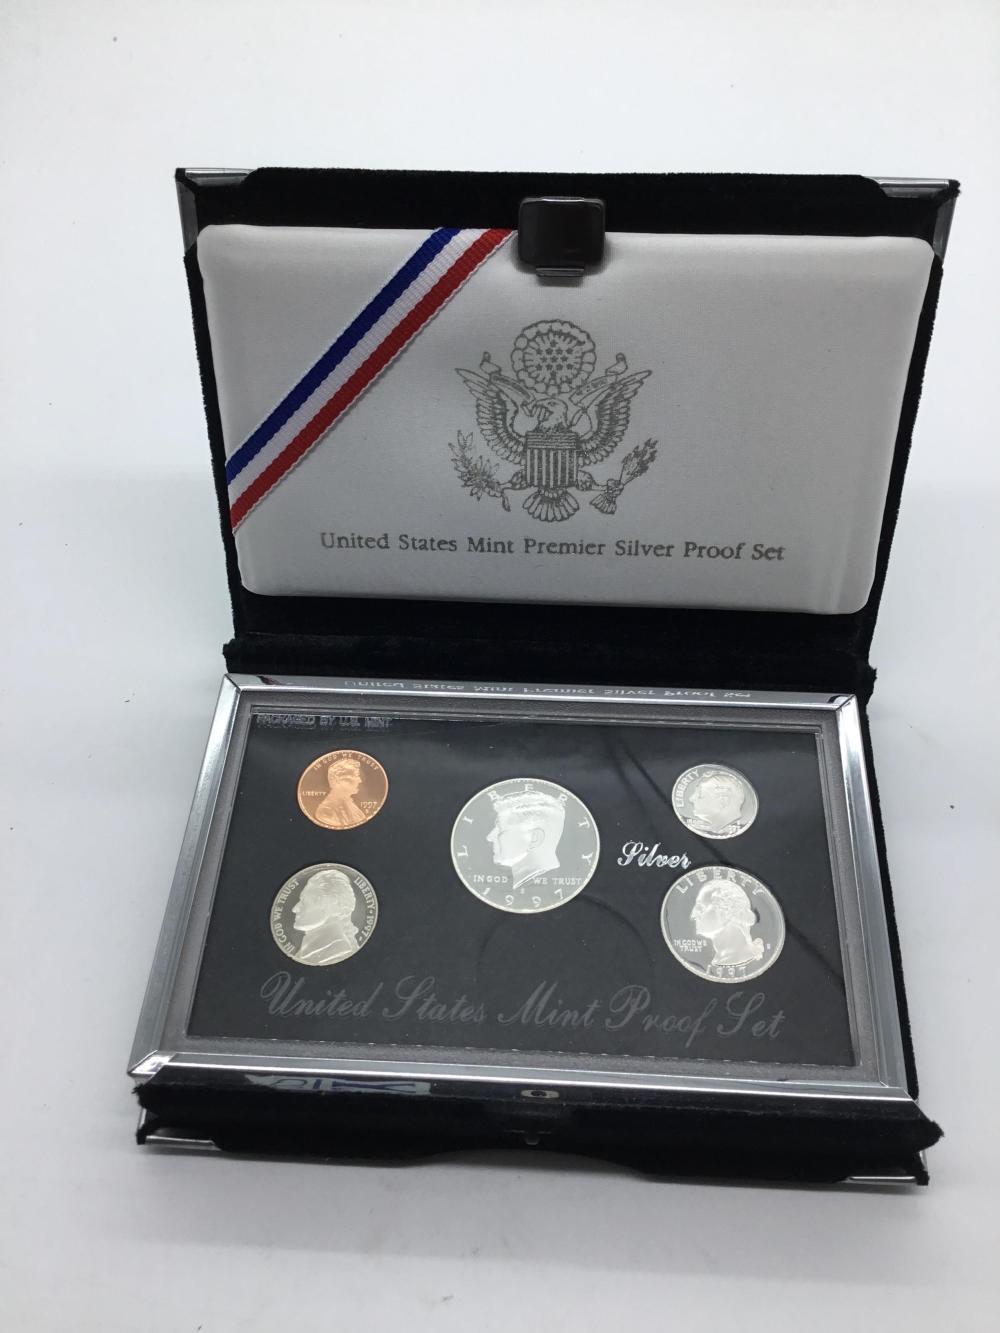 1997 Premier United States mint set